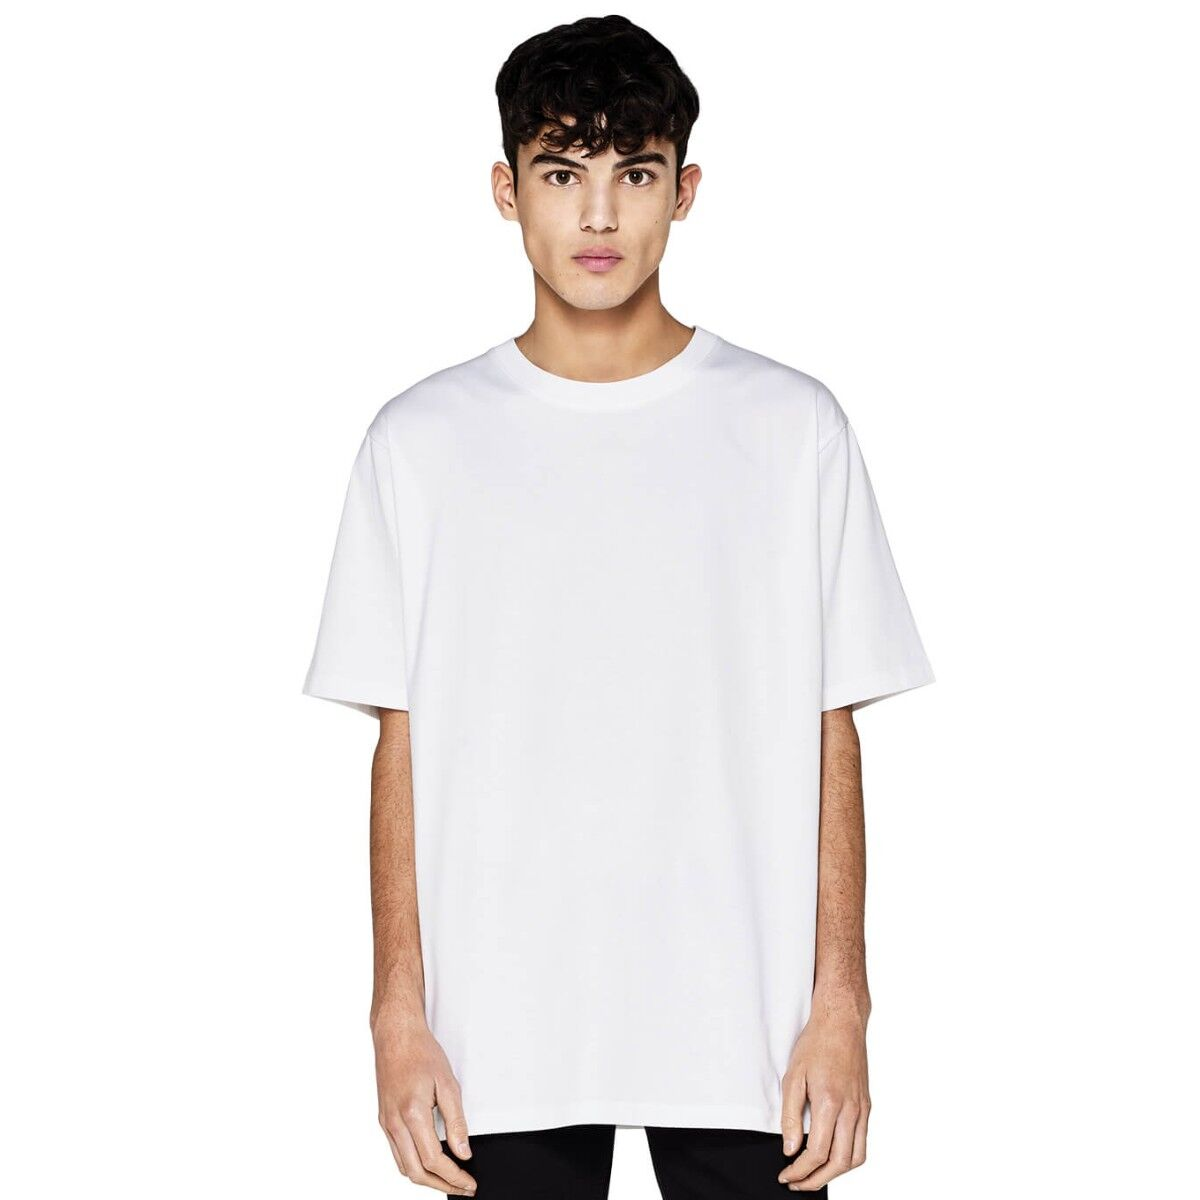 Continental Unisex Oversized T-shirts